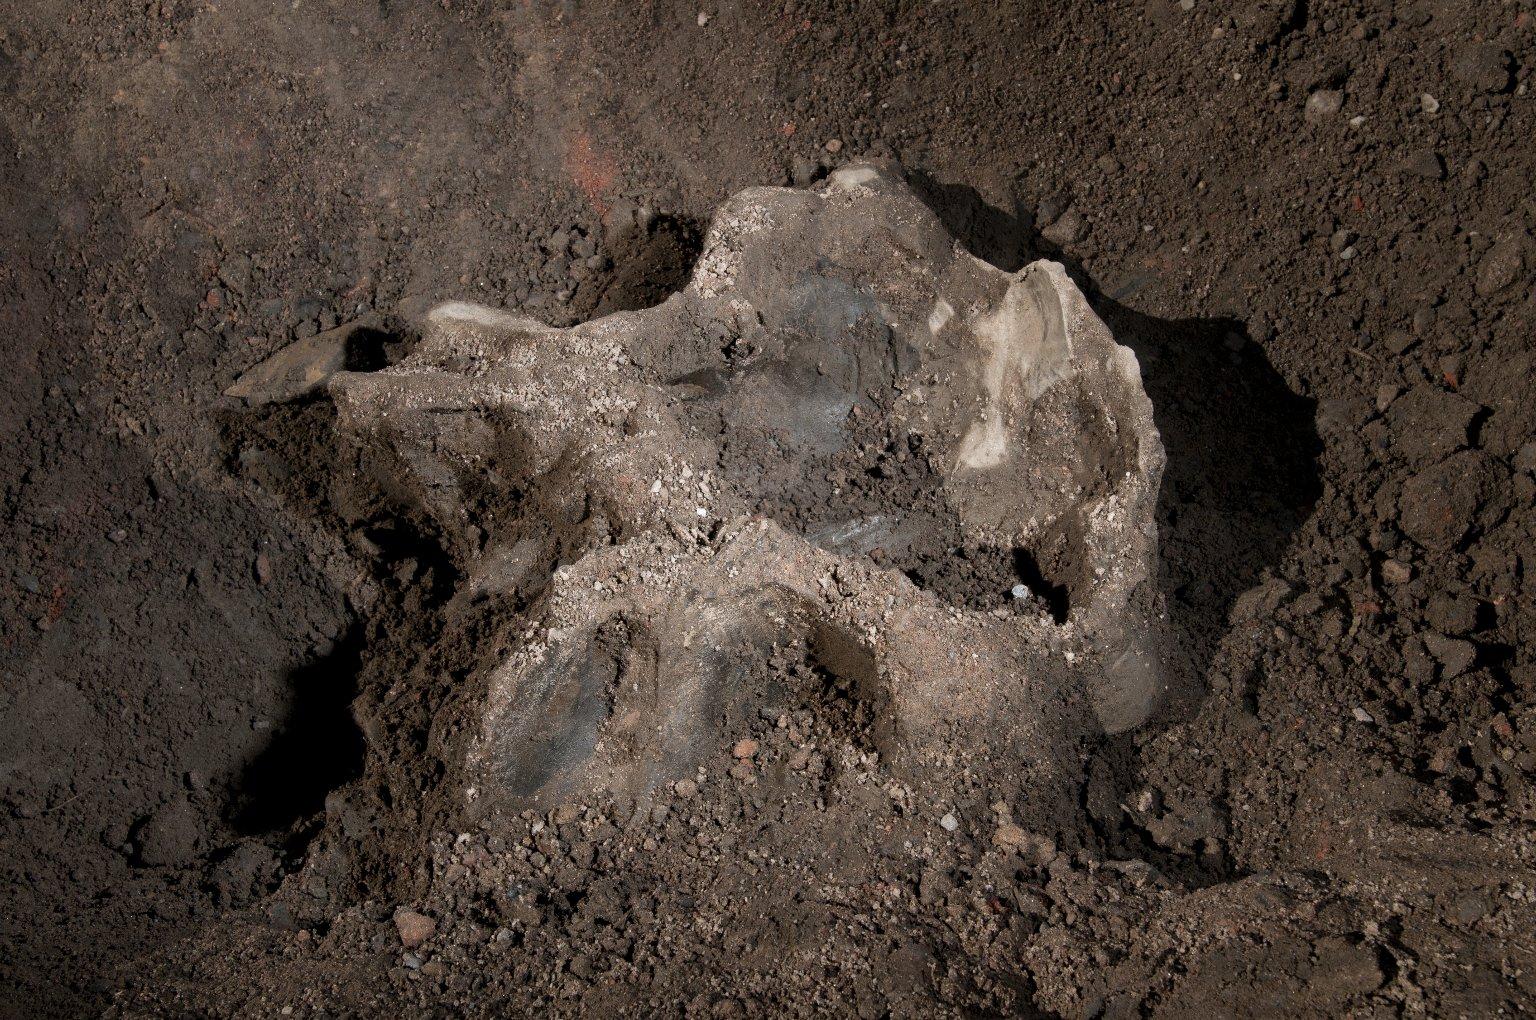 Snowmastodon Excavation,Fossils